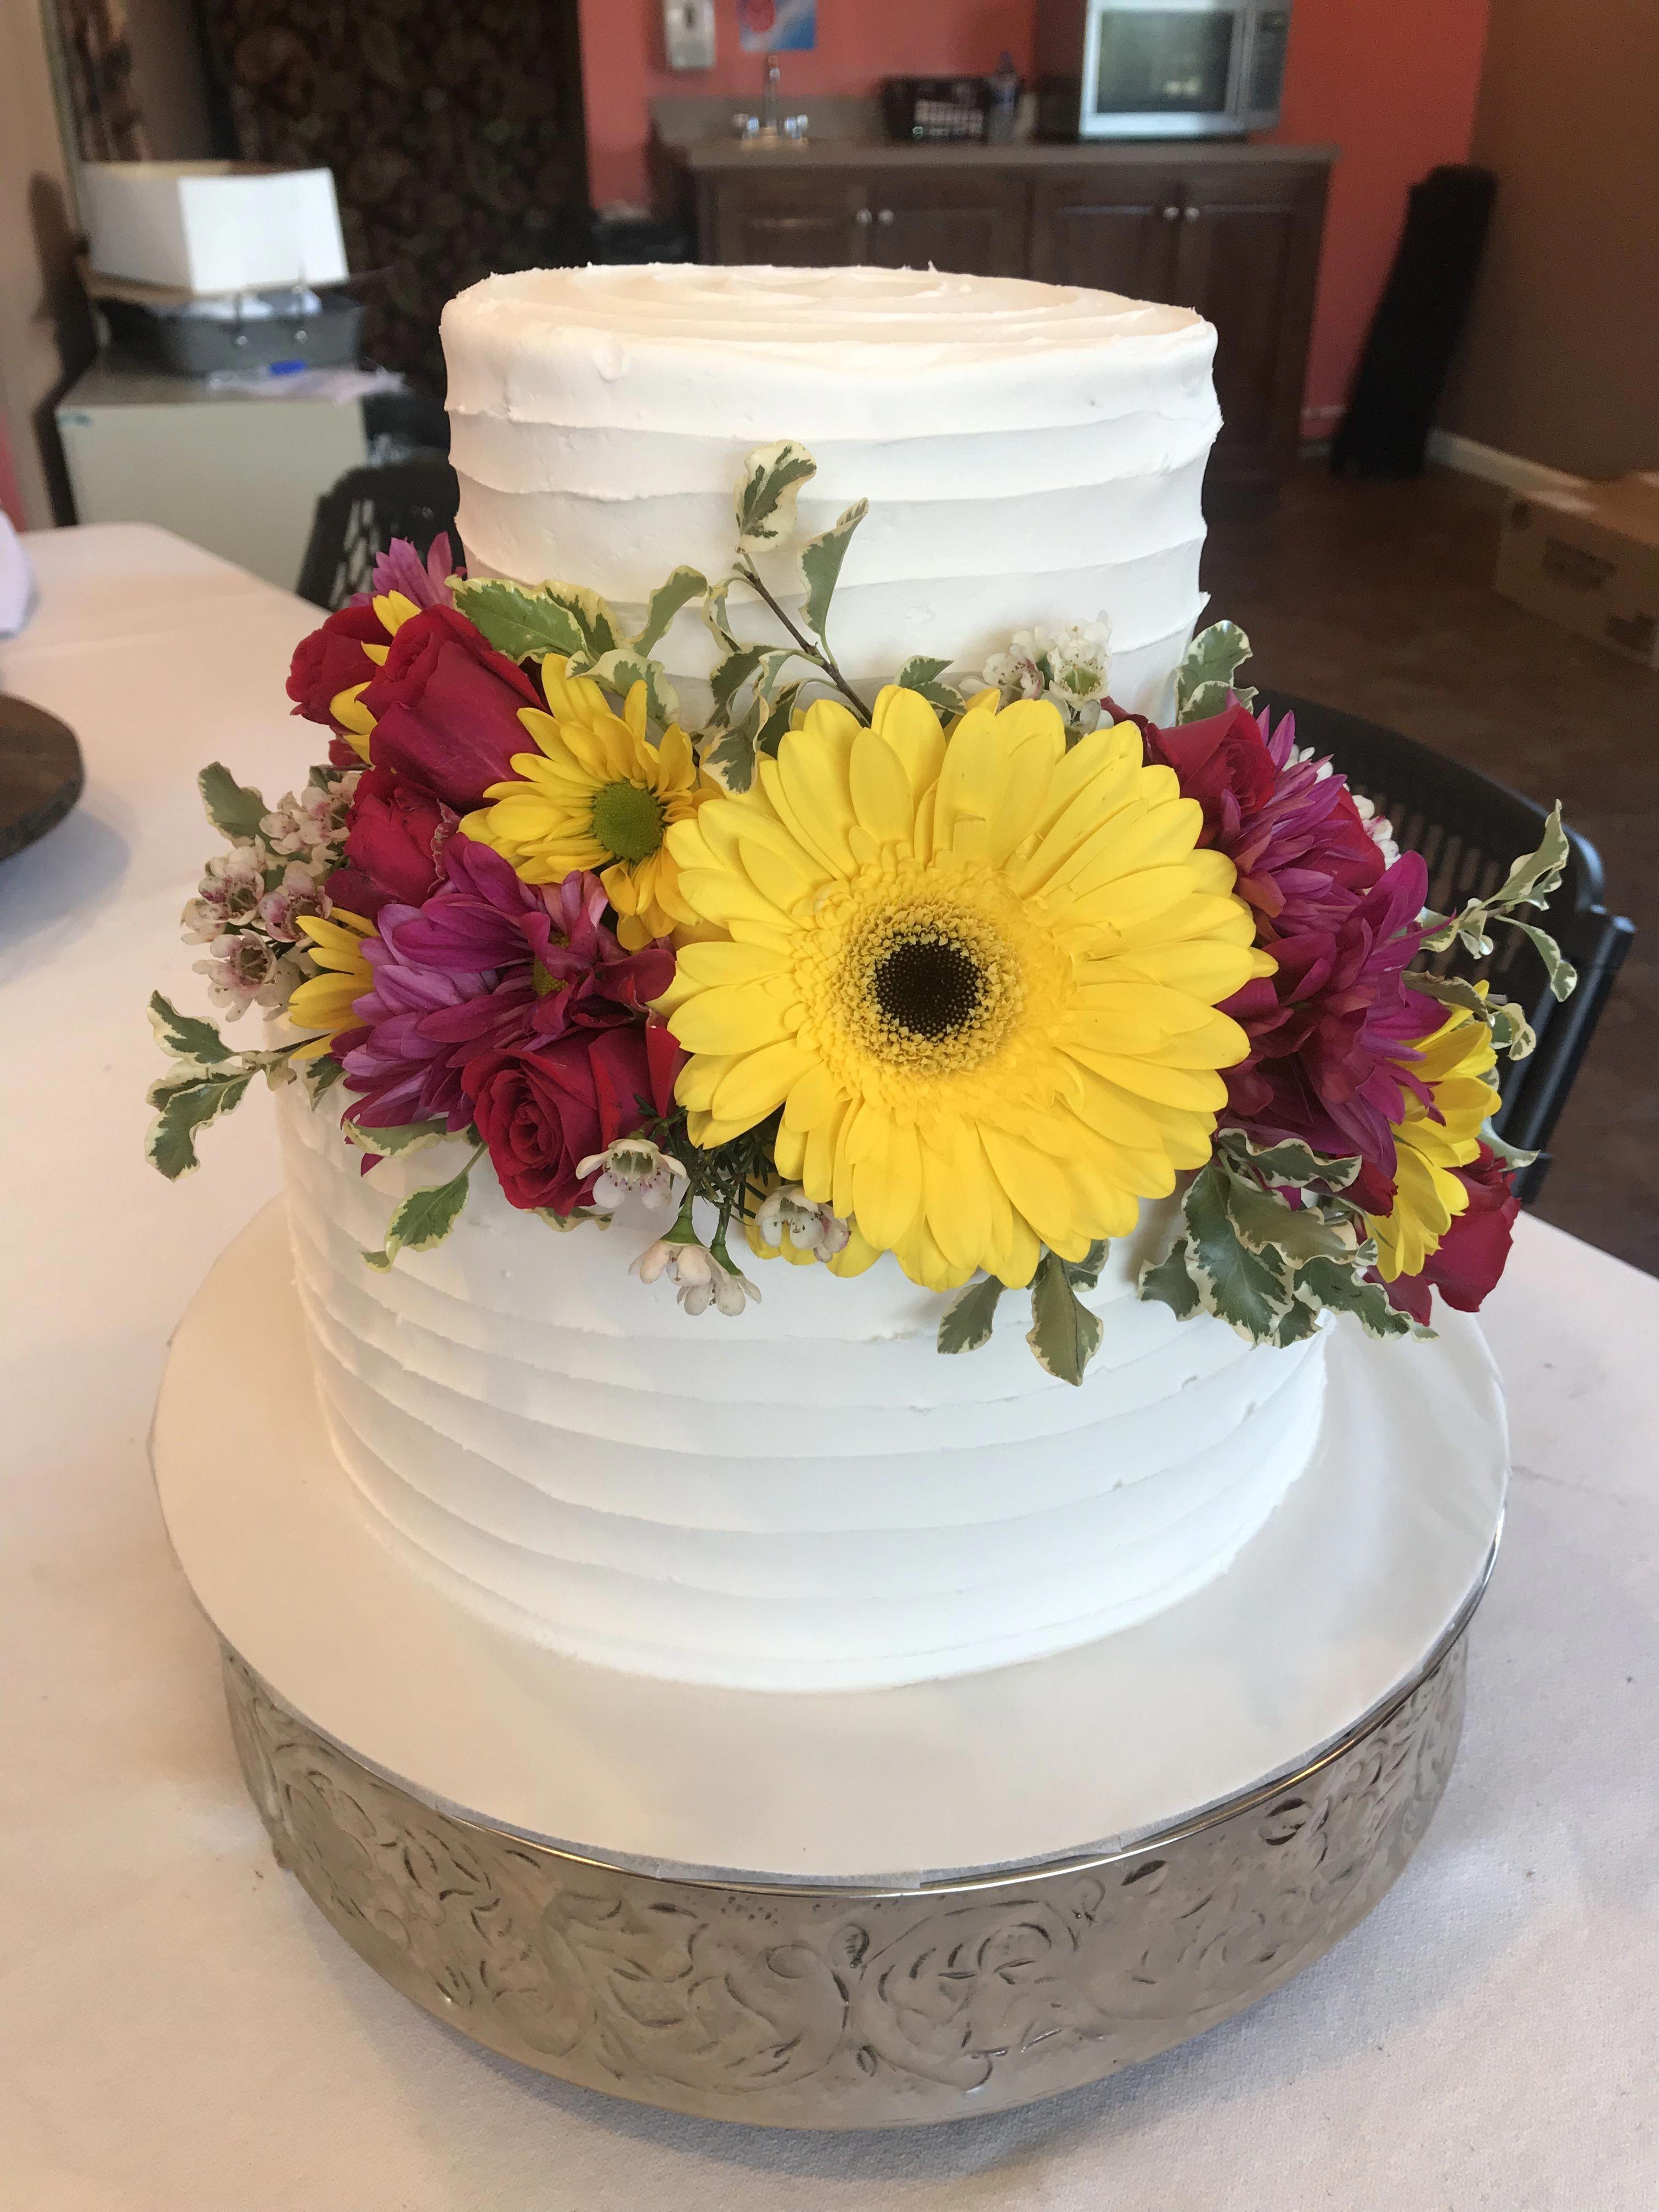 Never under no scenarios place your wedding event cake